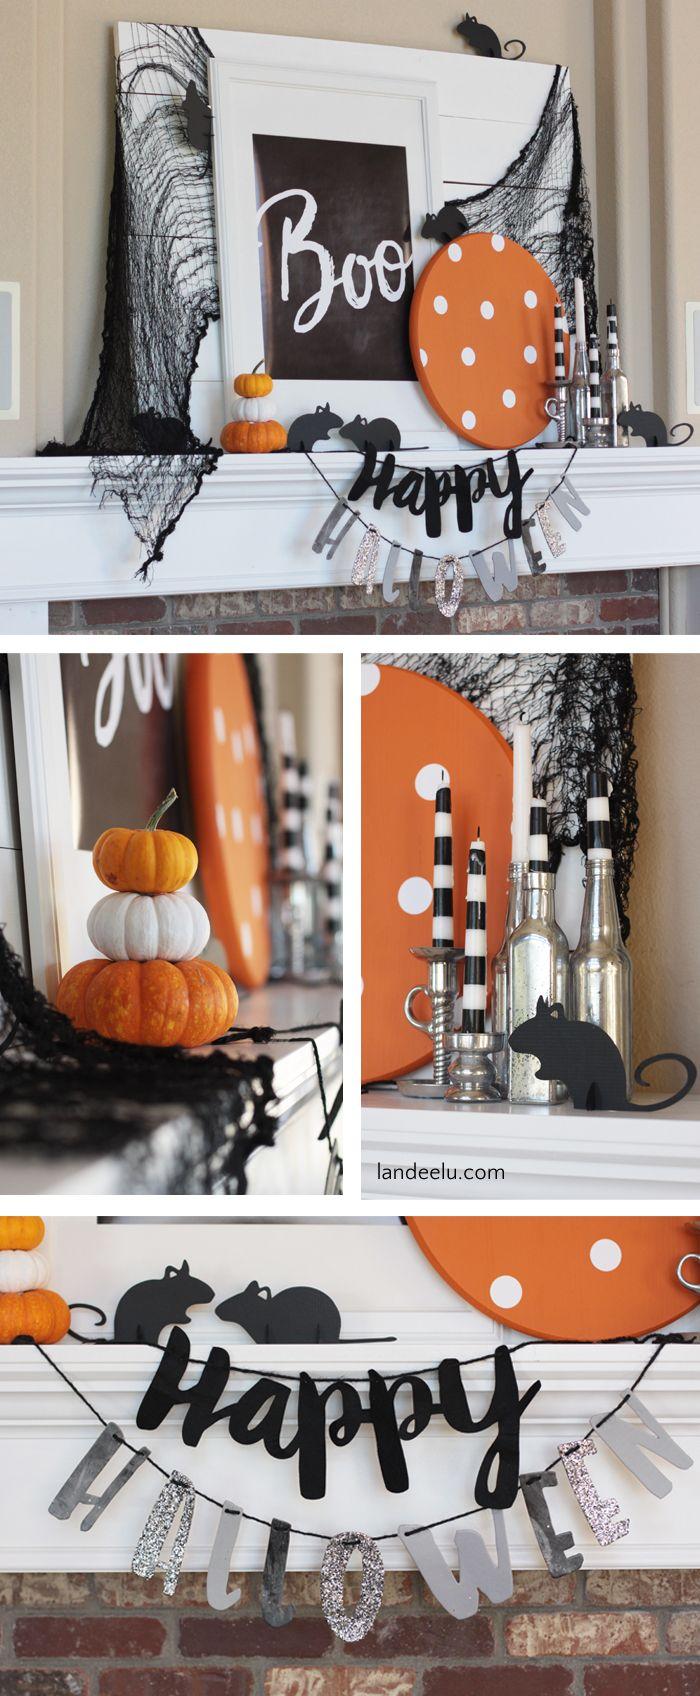 boo halloween mantel with mice - Halloween Mantel Ideas